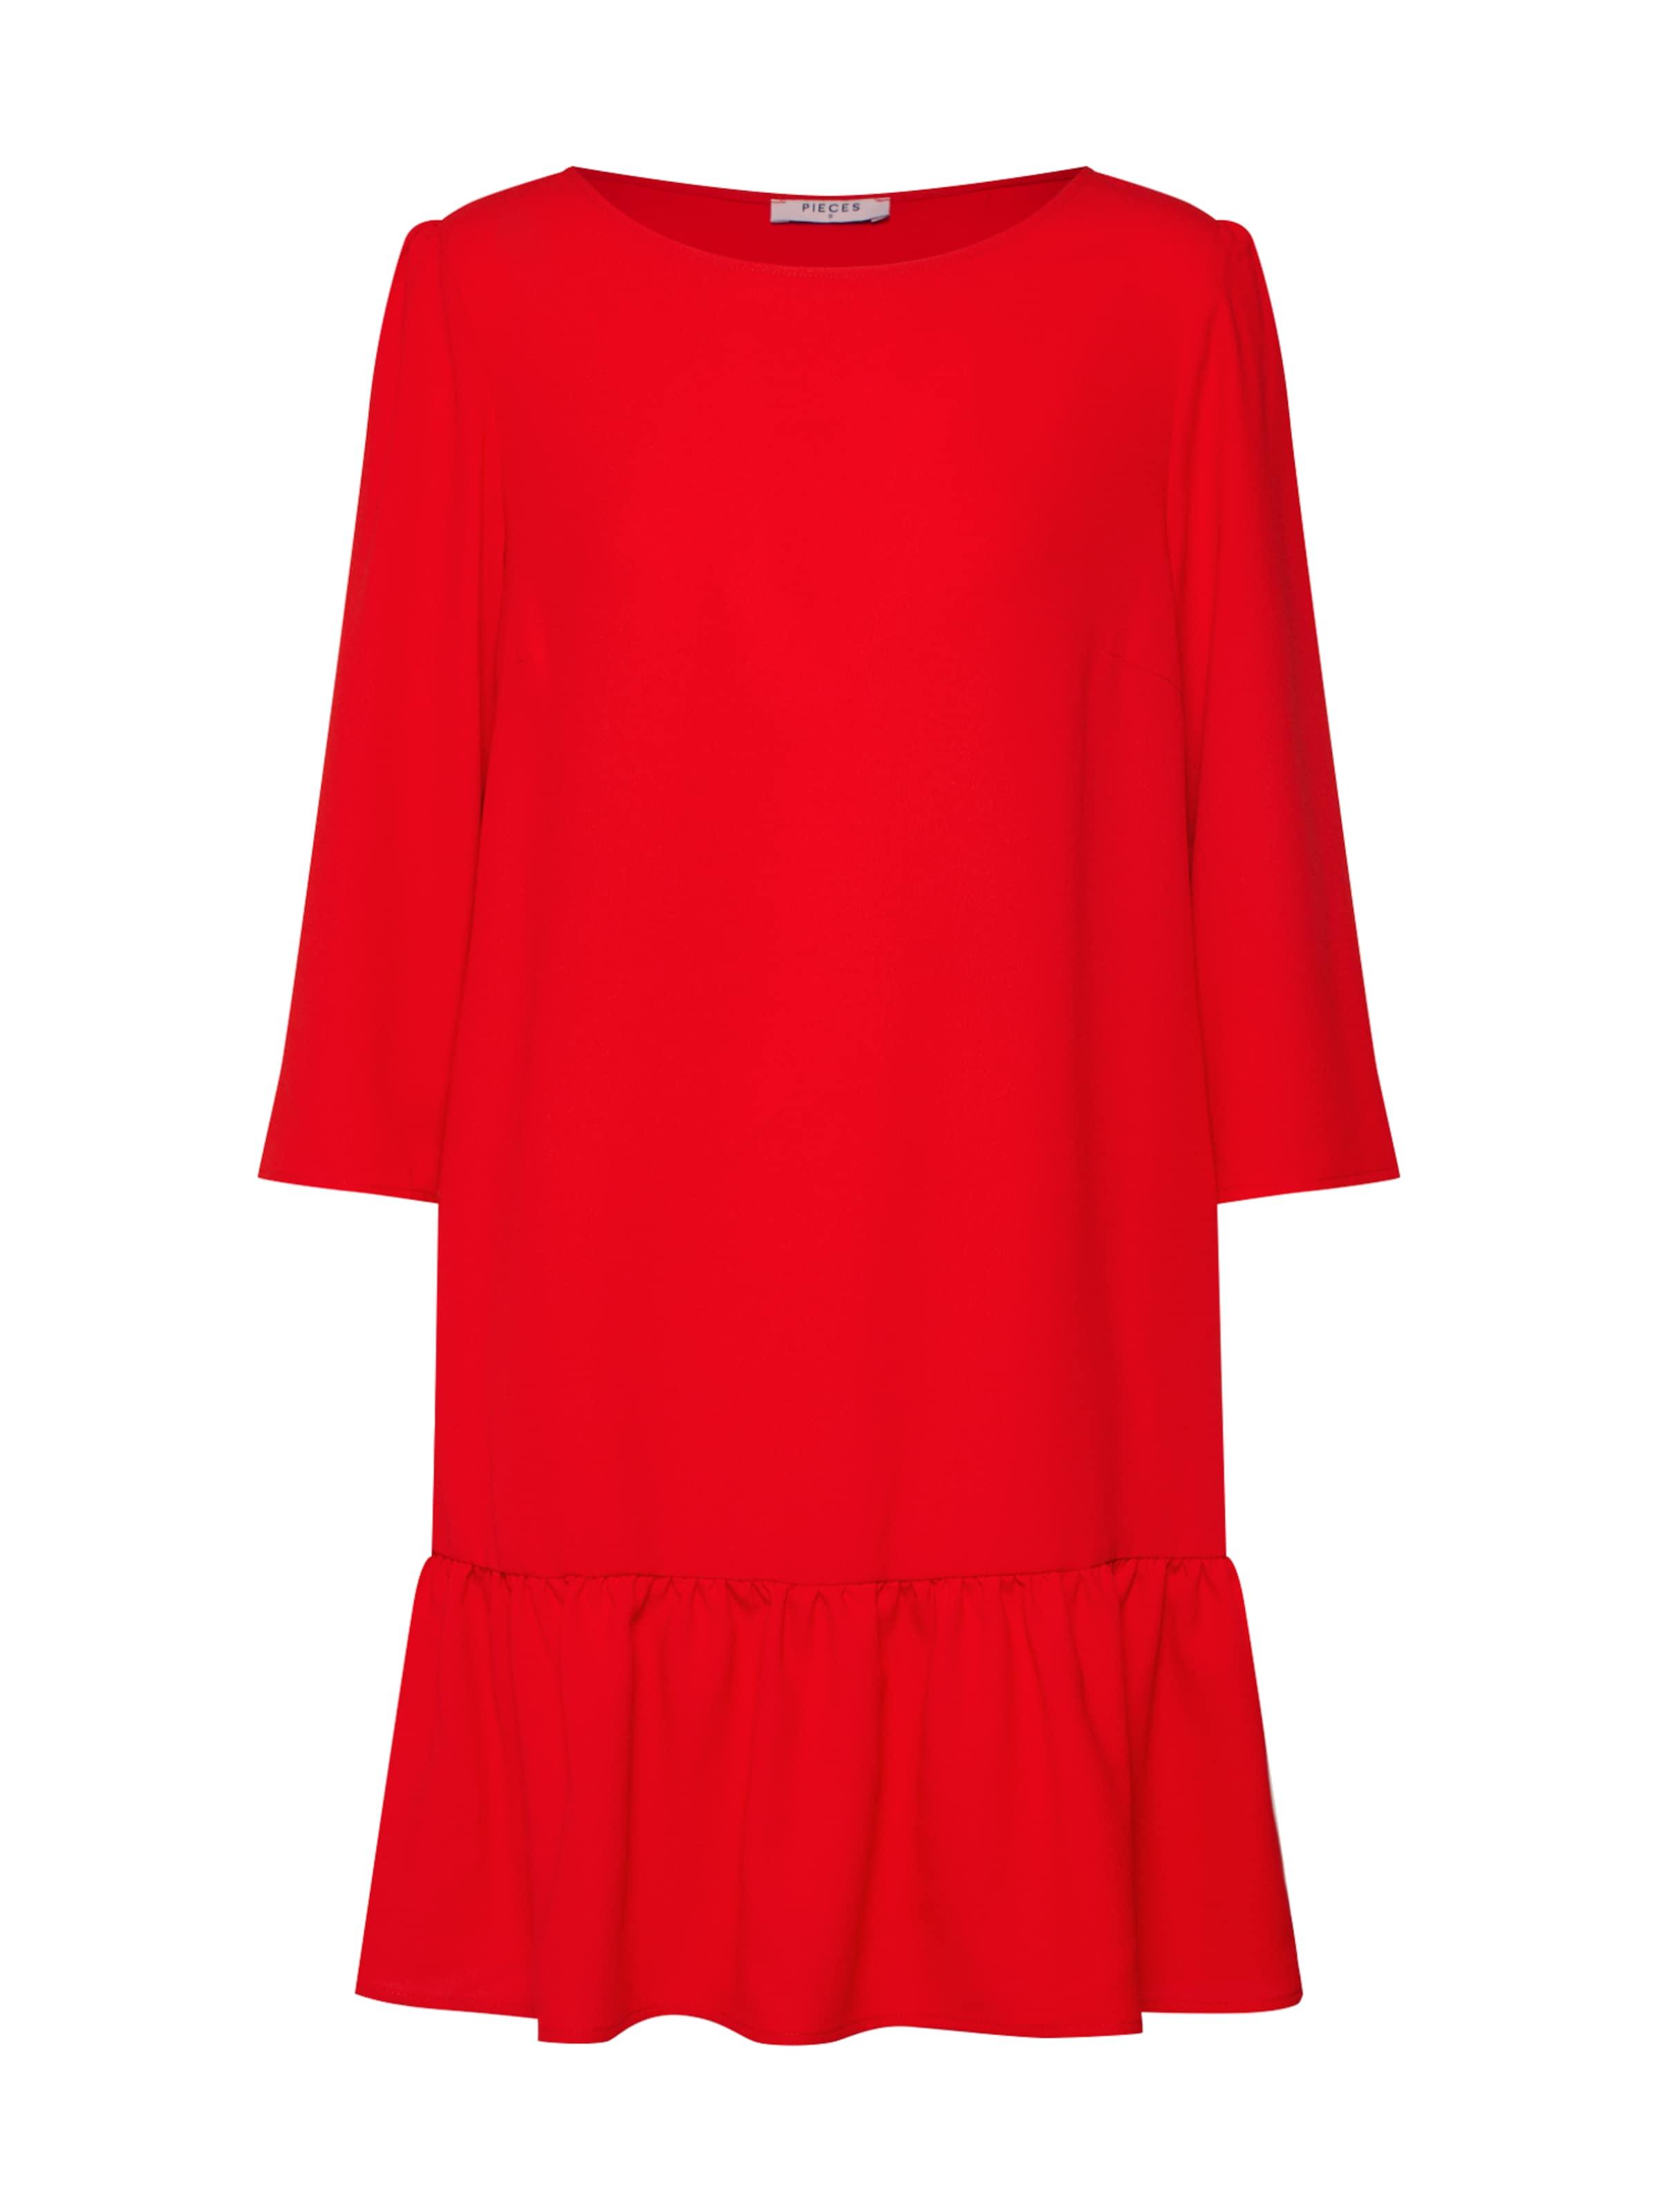 Pieces 'britney' Rot Kleid Pieces In ZiOTwuPXk